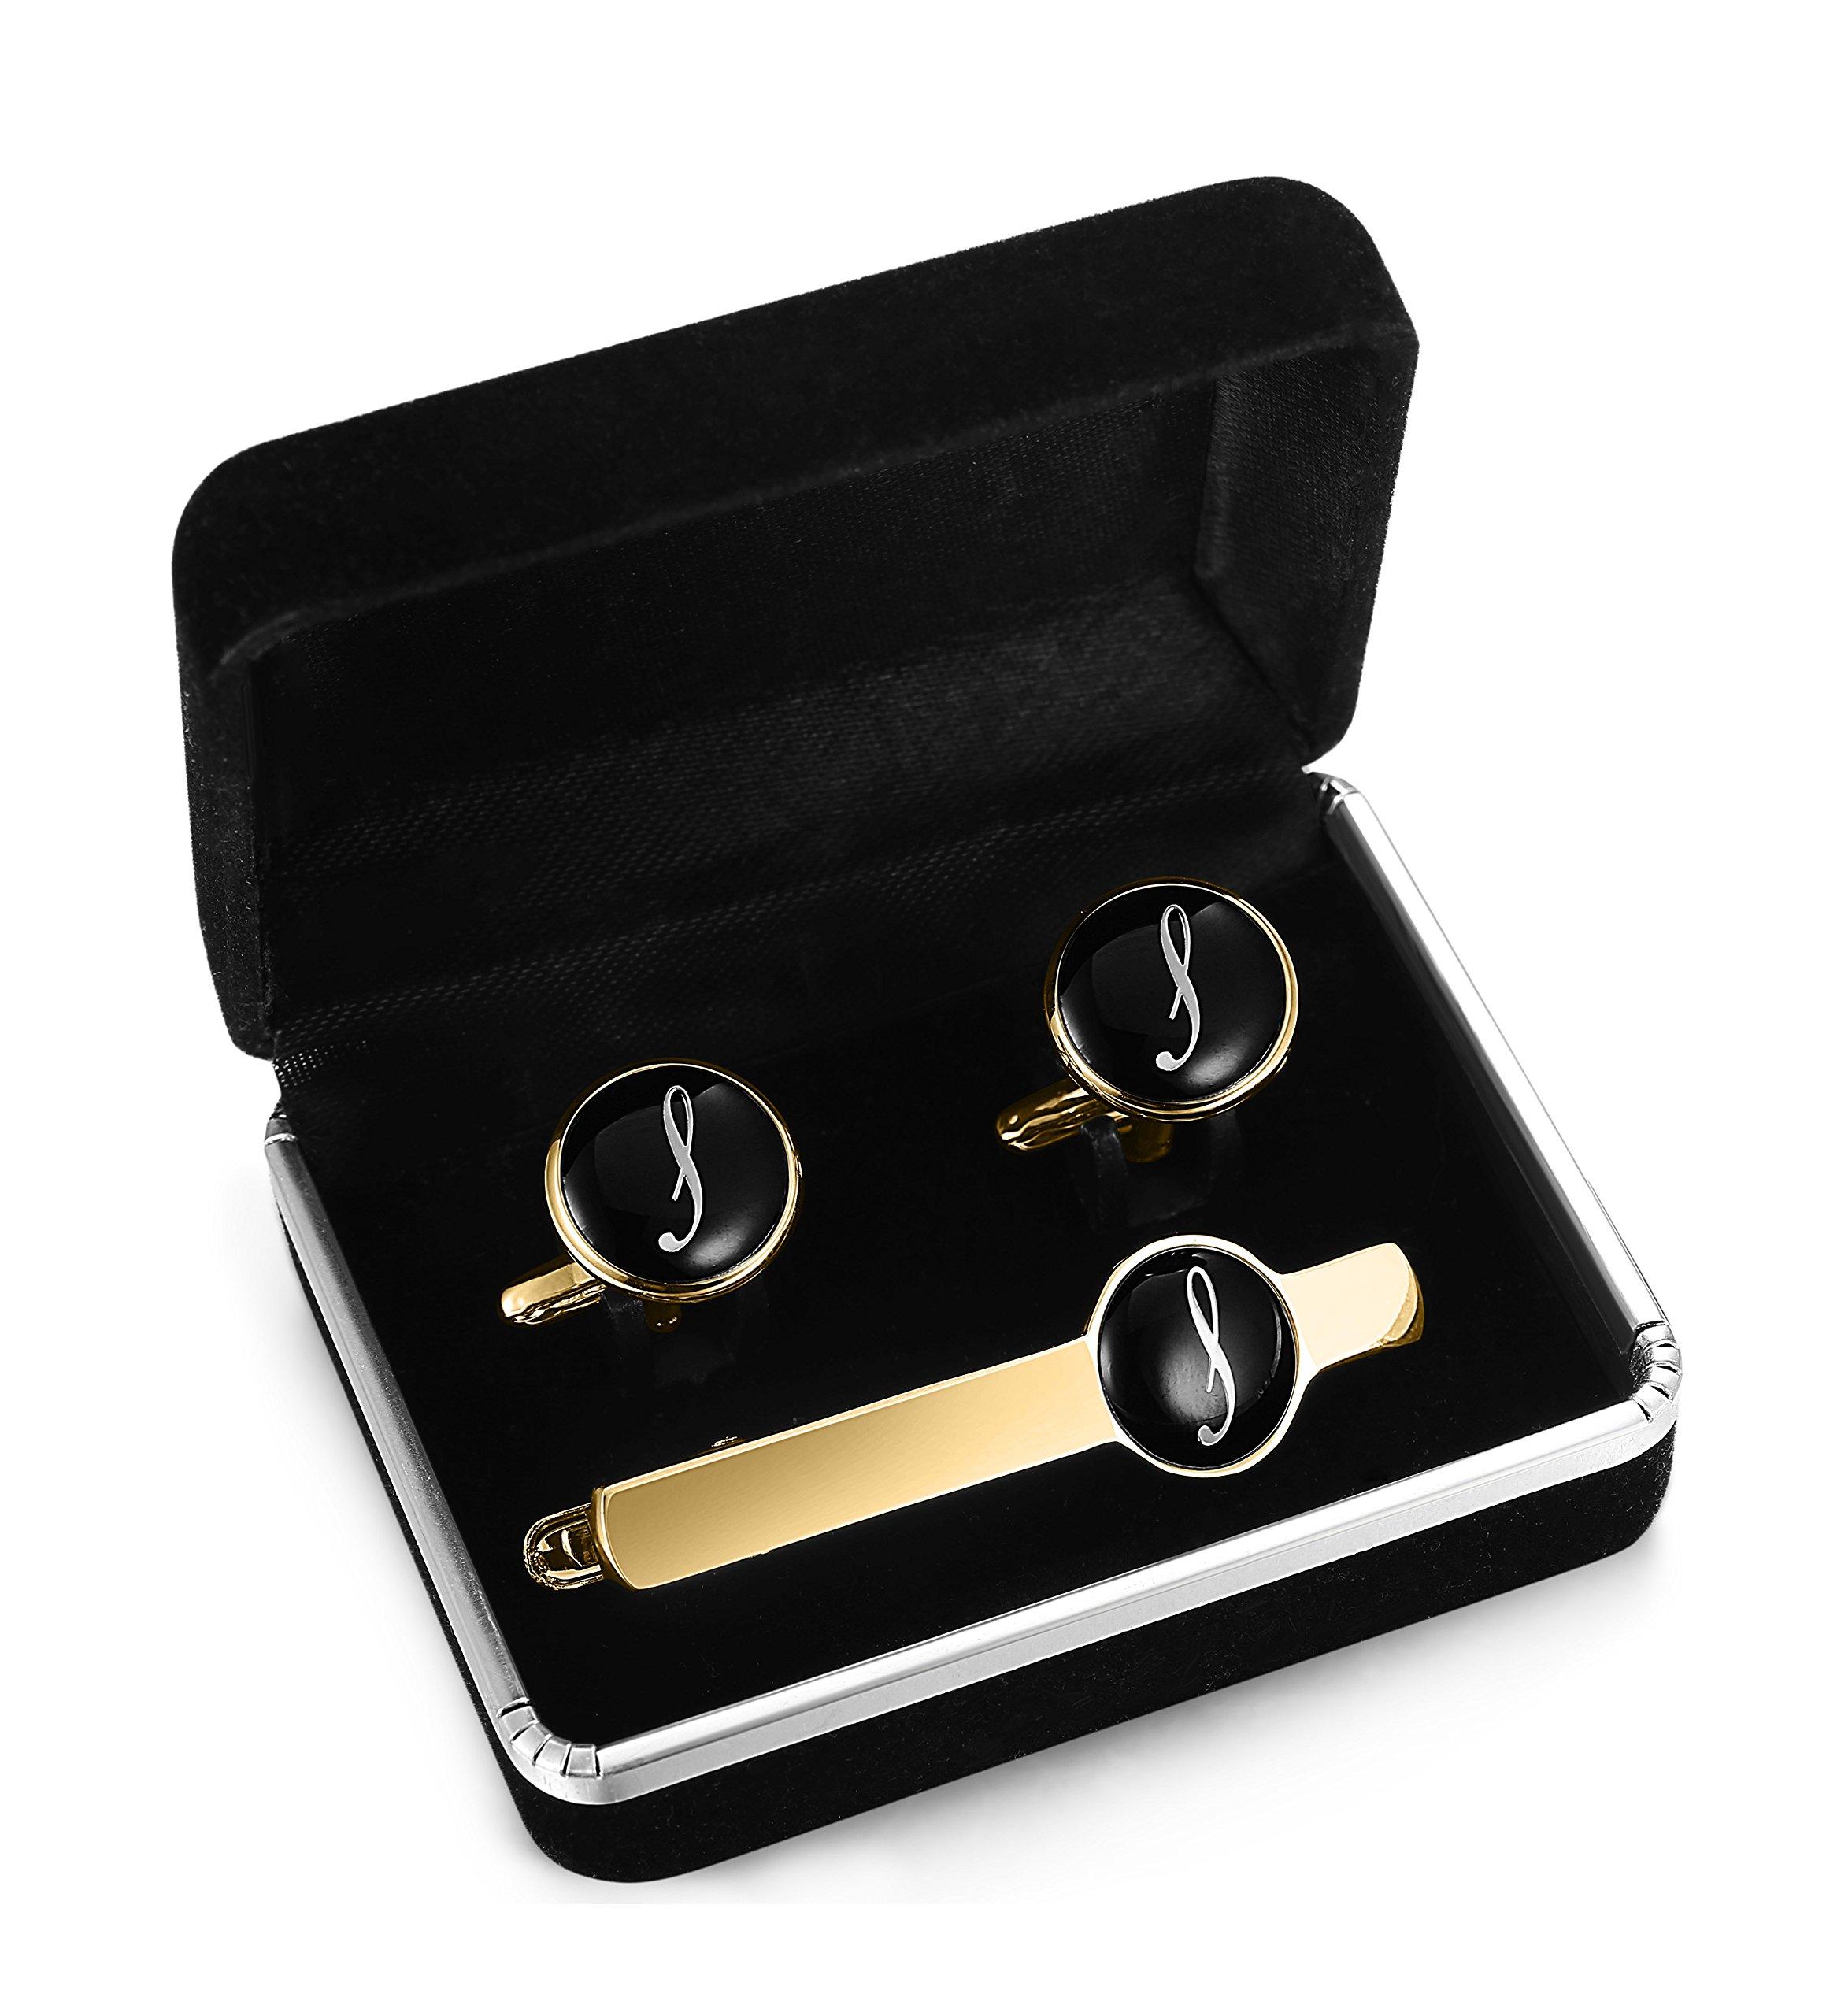 ORAZIO Engraved Tie Clip and Initial Cufflinks for Men Women Alphabet Letter S Cufflinks Tie Bar Set for Business Wedding Gold Tone